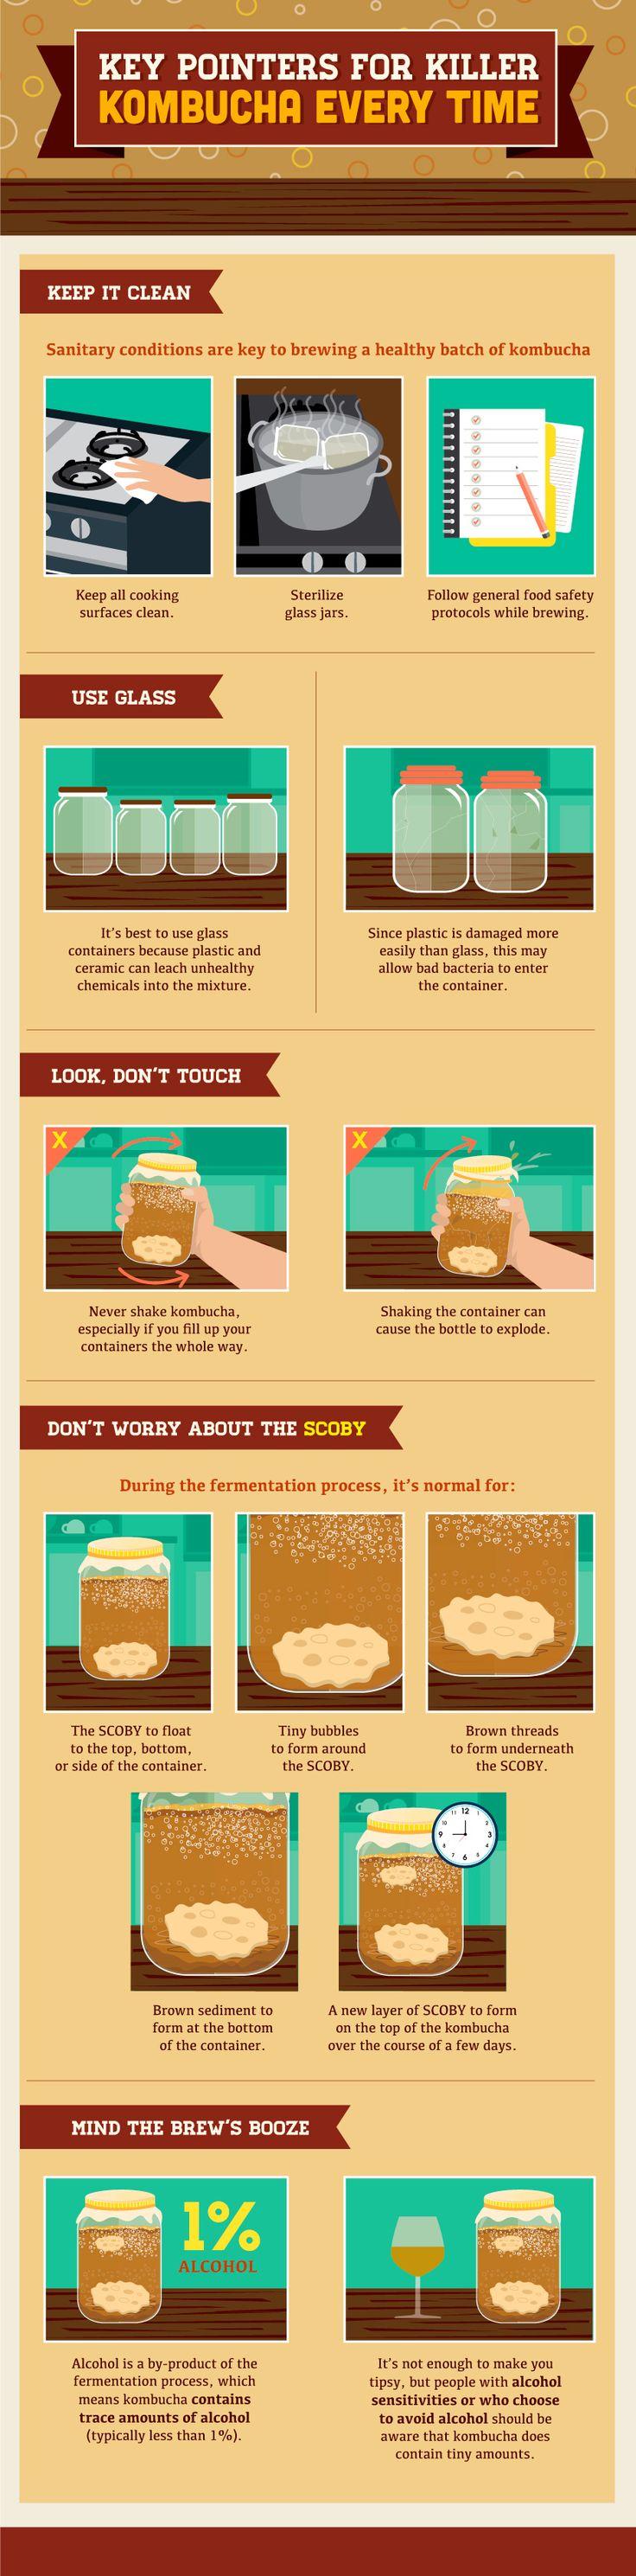 Tips for kombucha